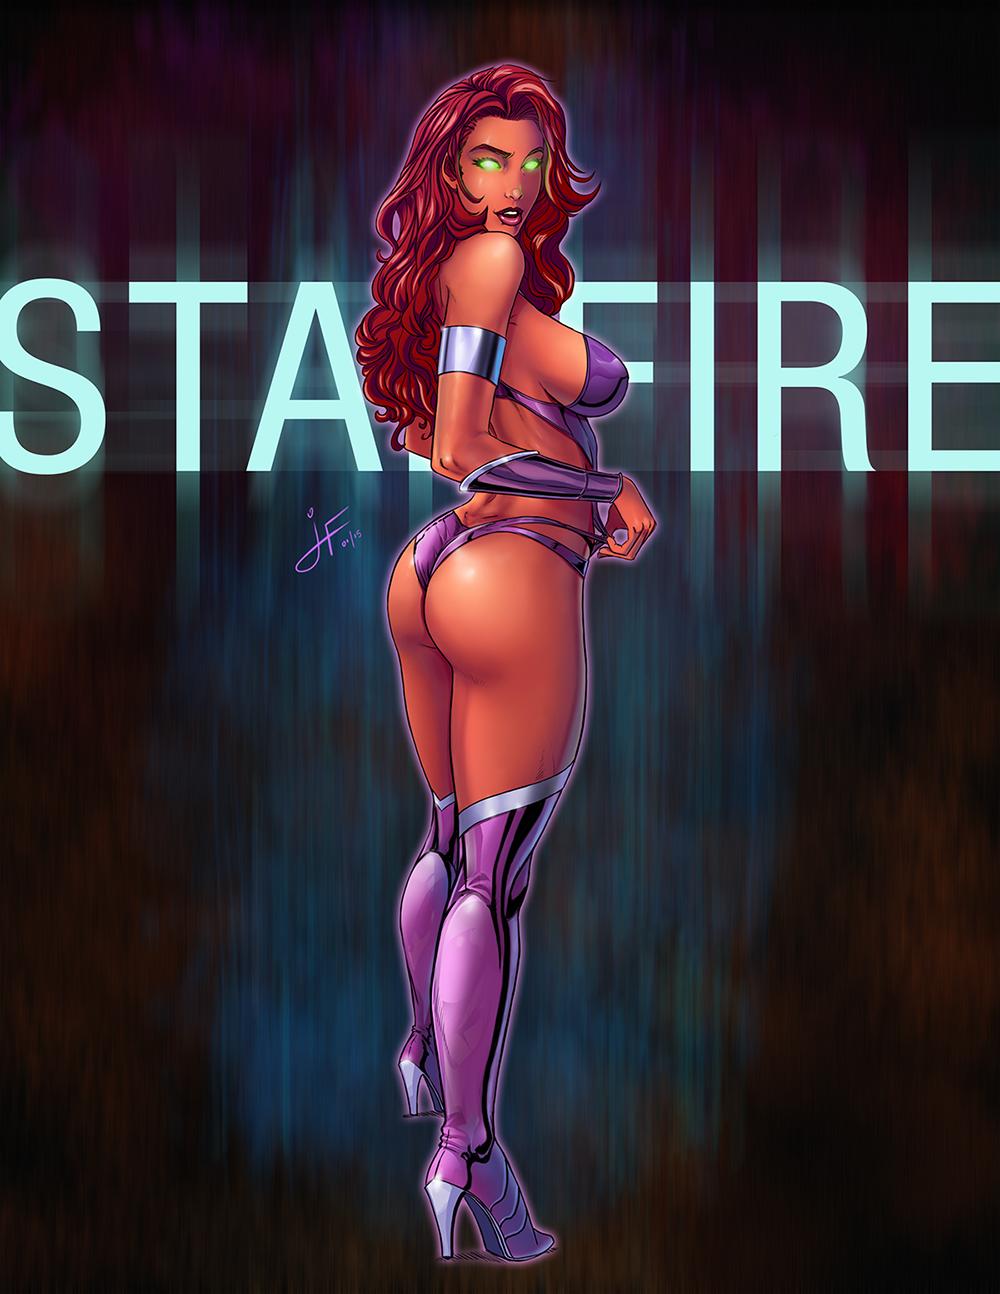 Starfire rubbing her vagina, celebrity pantyhose partii